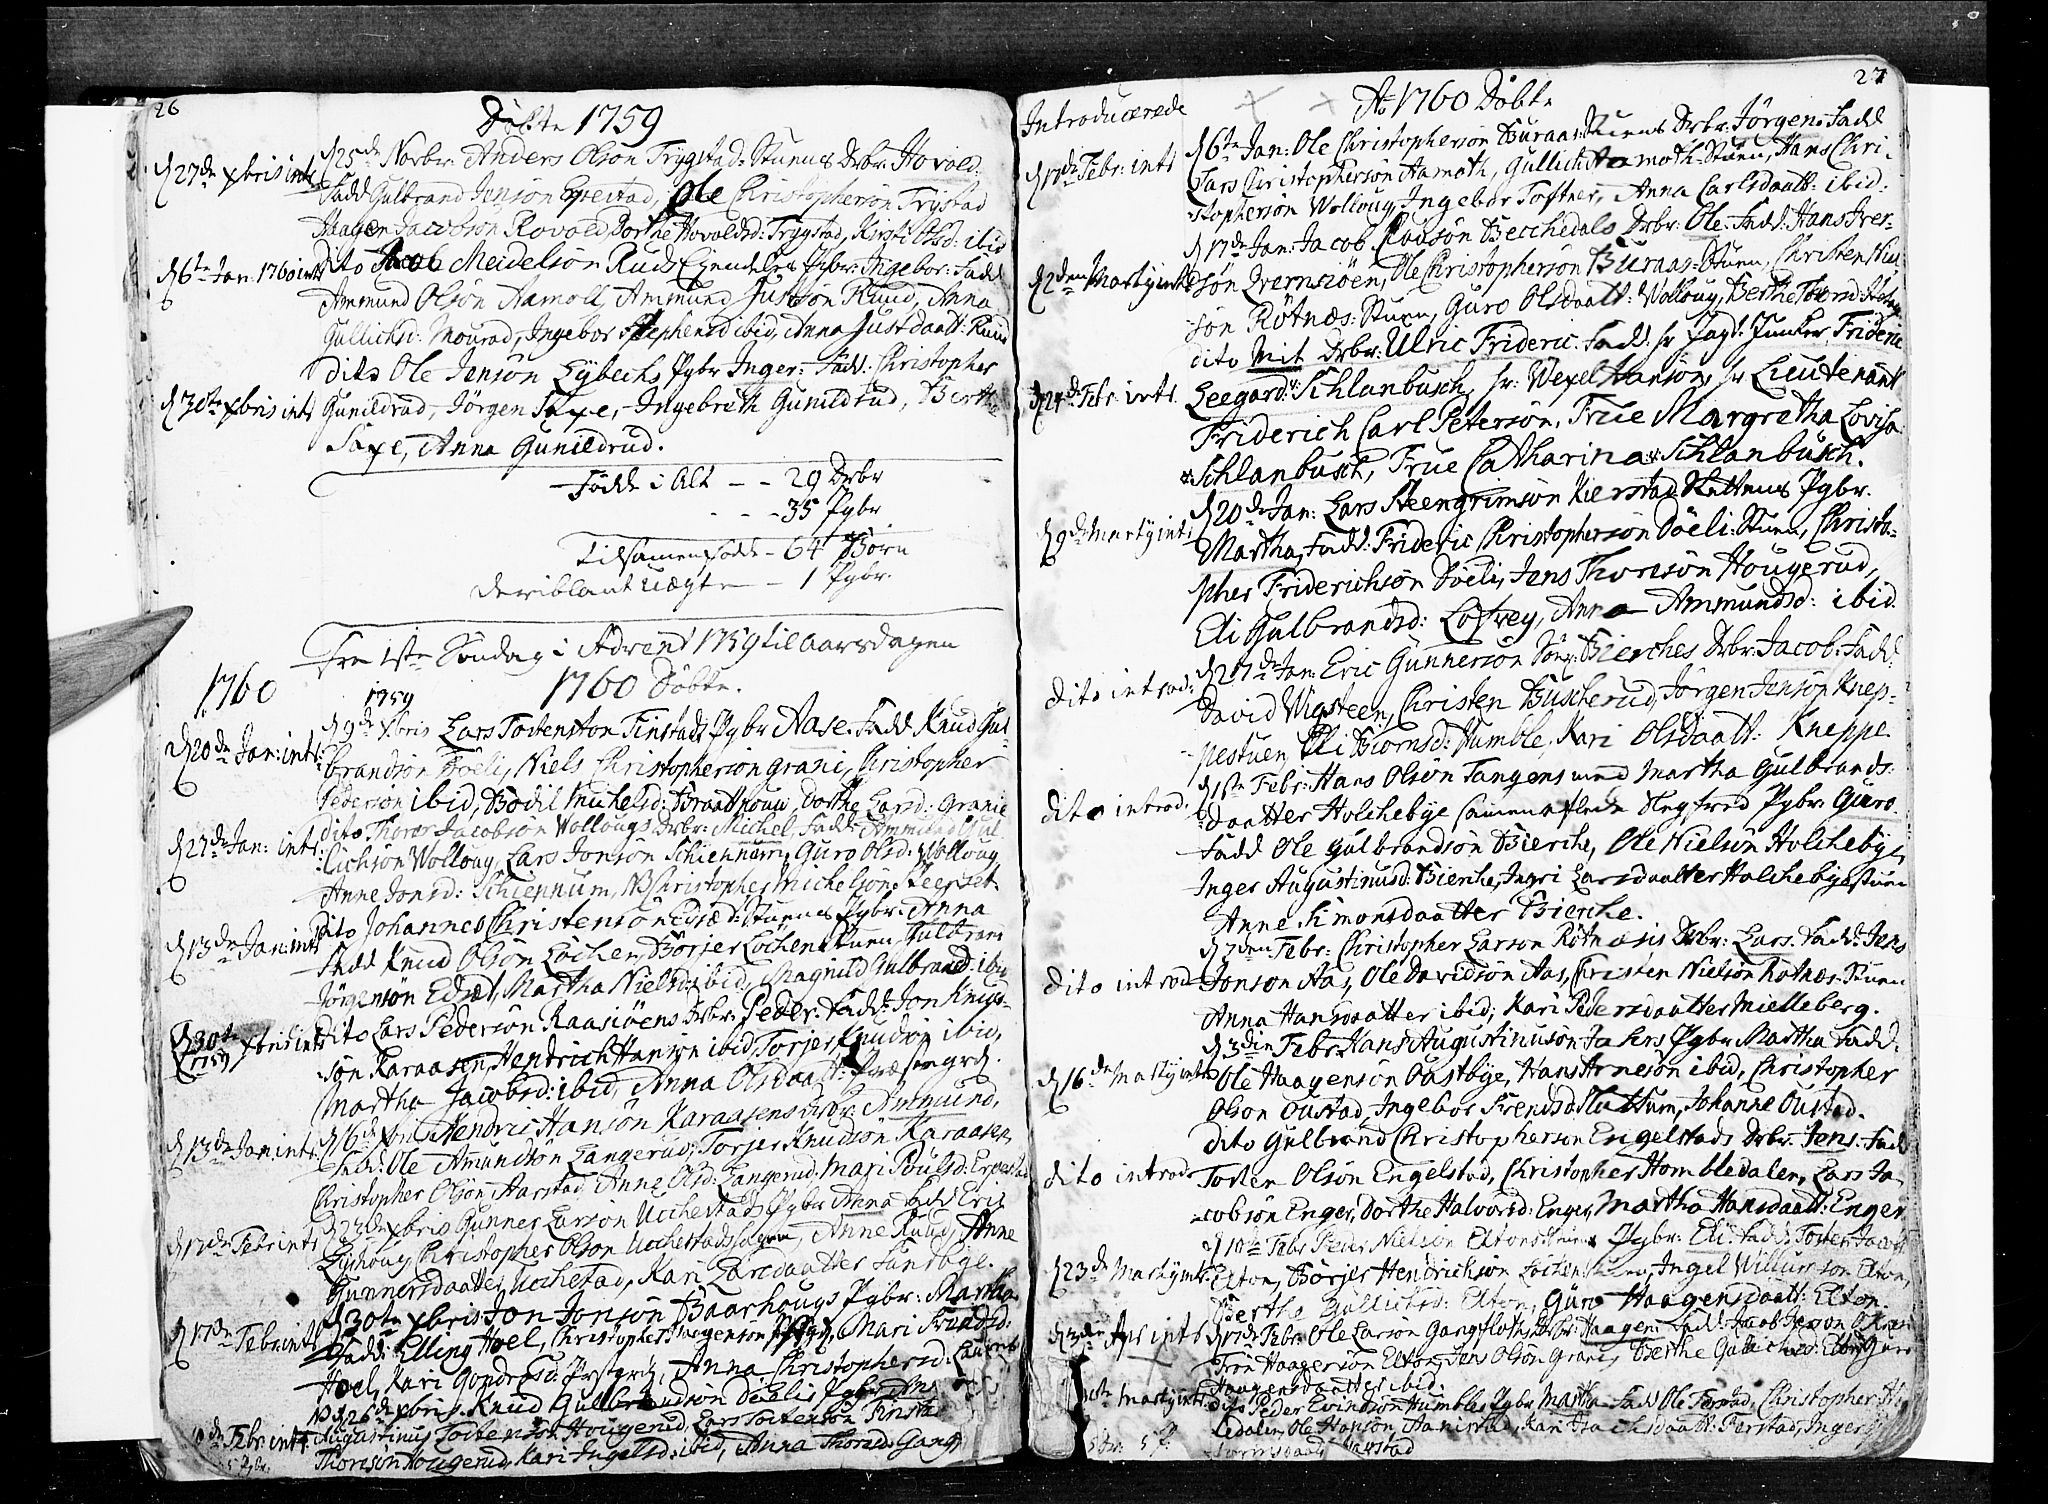 SAO, Nannestad prestekontor Kirkebøker, F/Fa/L0007: Ministerialbok nr. I 7, 1754-1791, s. 26-27